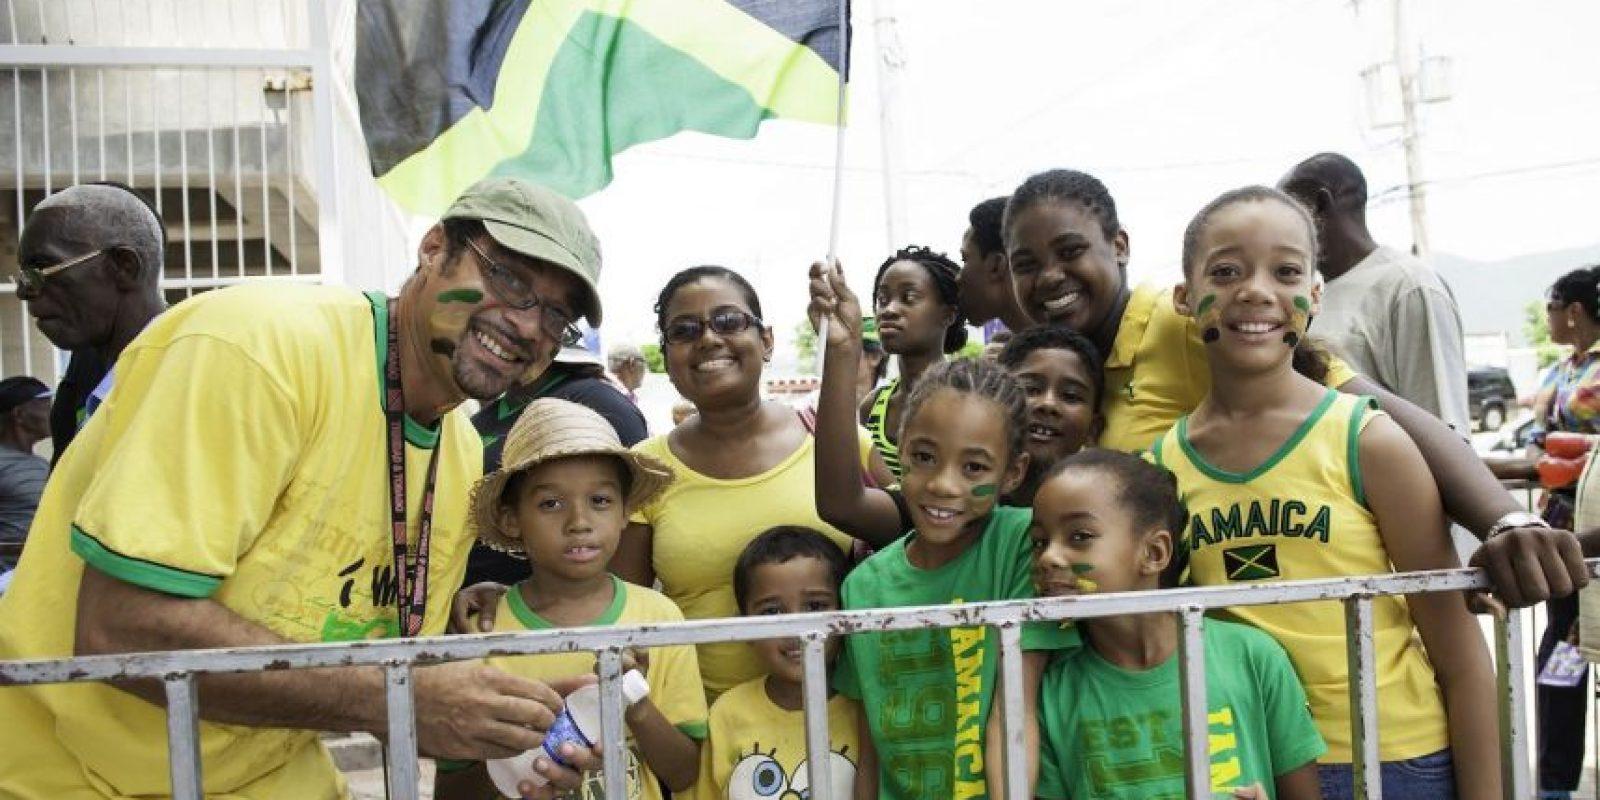 Jamaica Foto:Getty